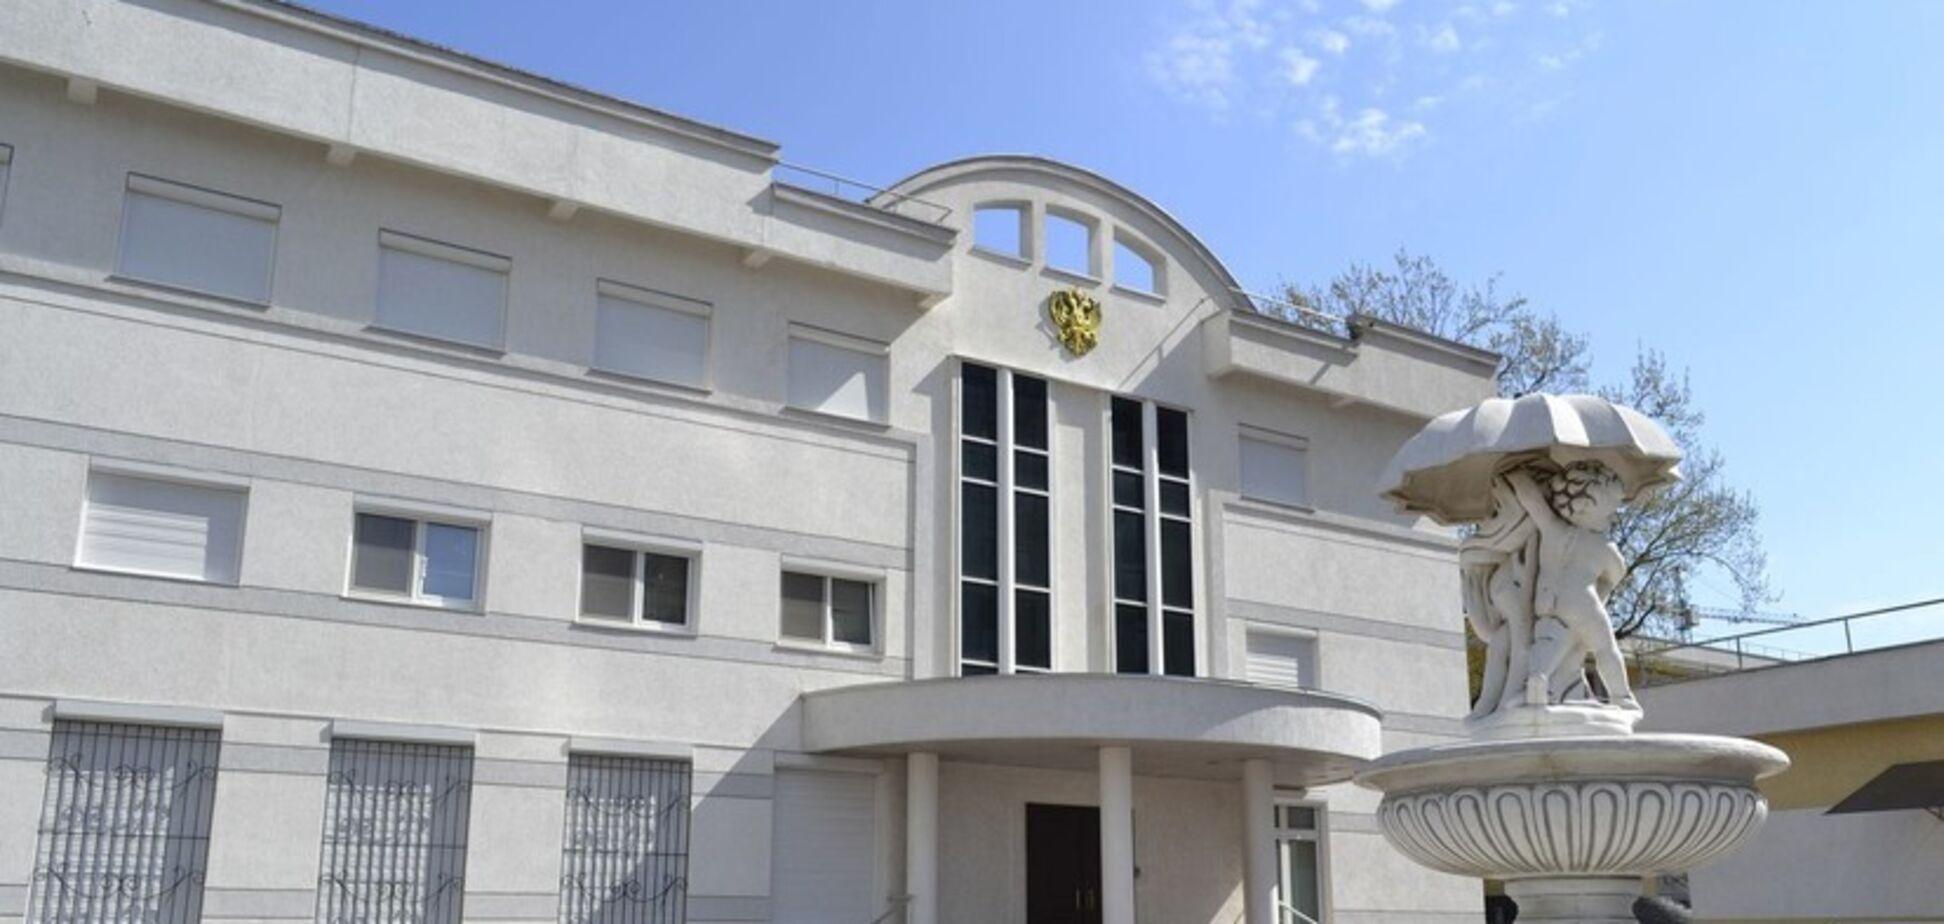 Украина объявила консула РФ в Одессе персоной нон грата